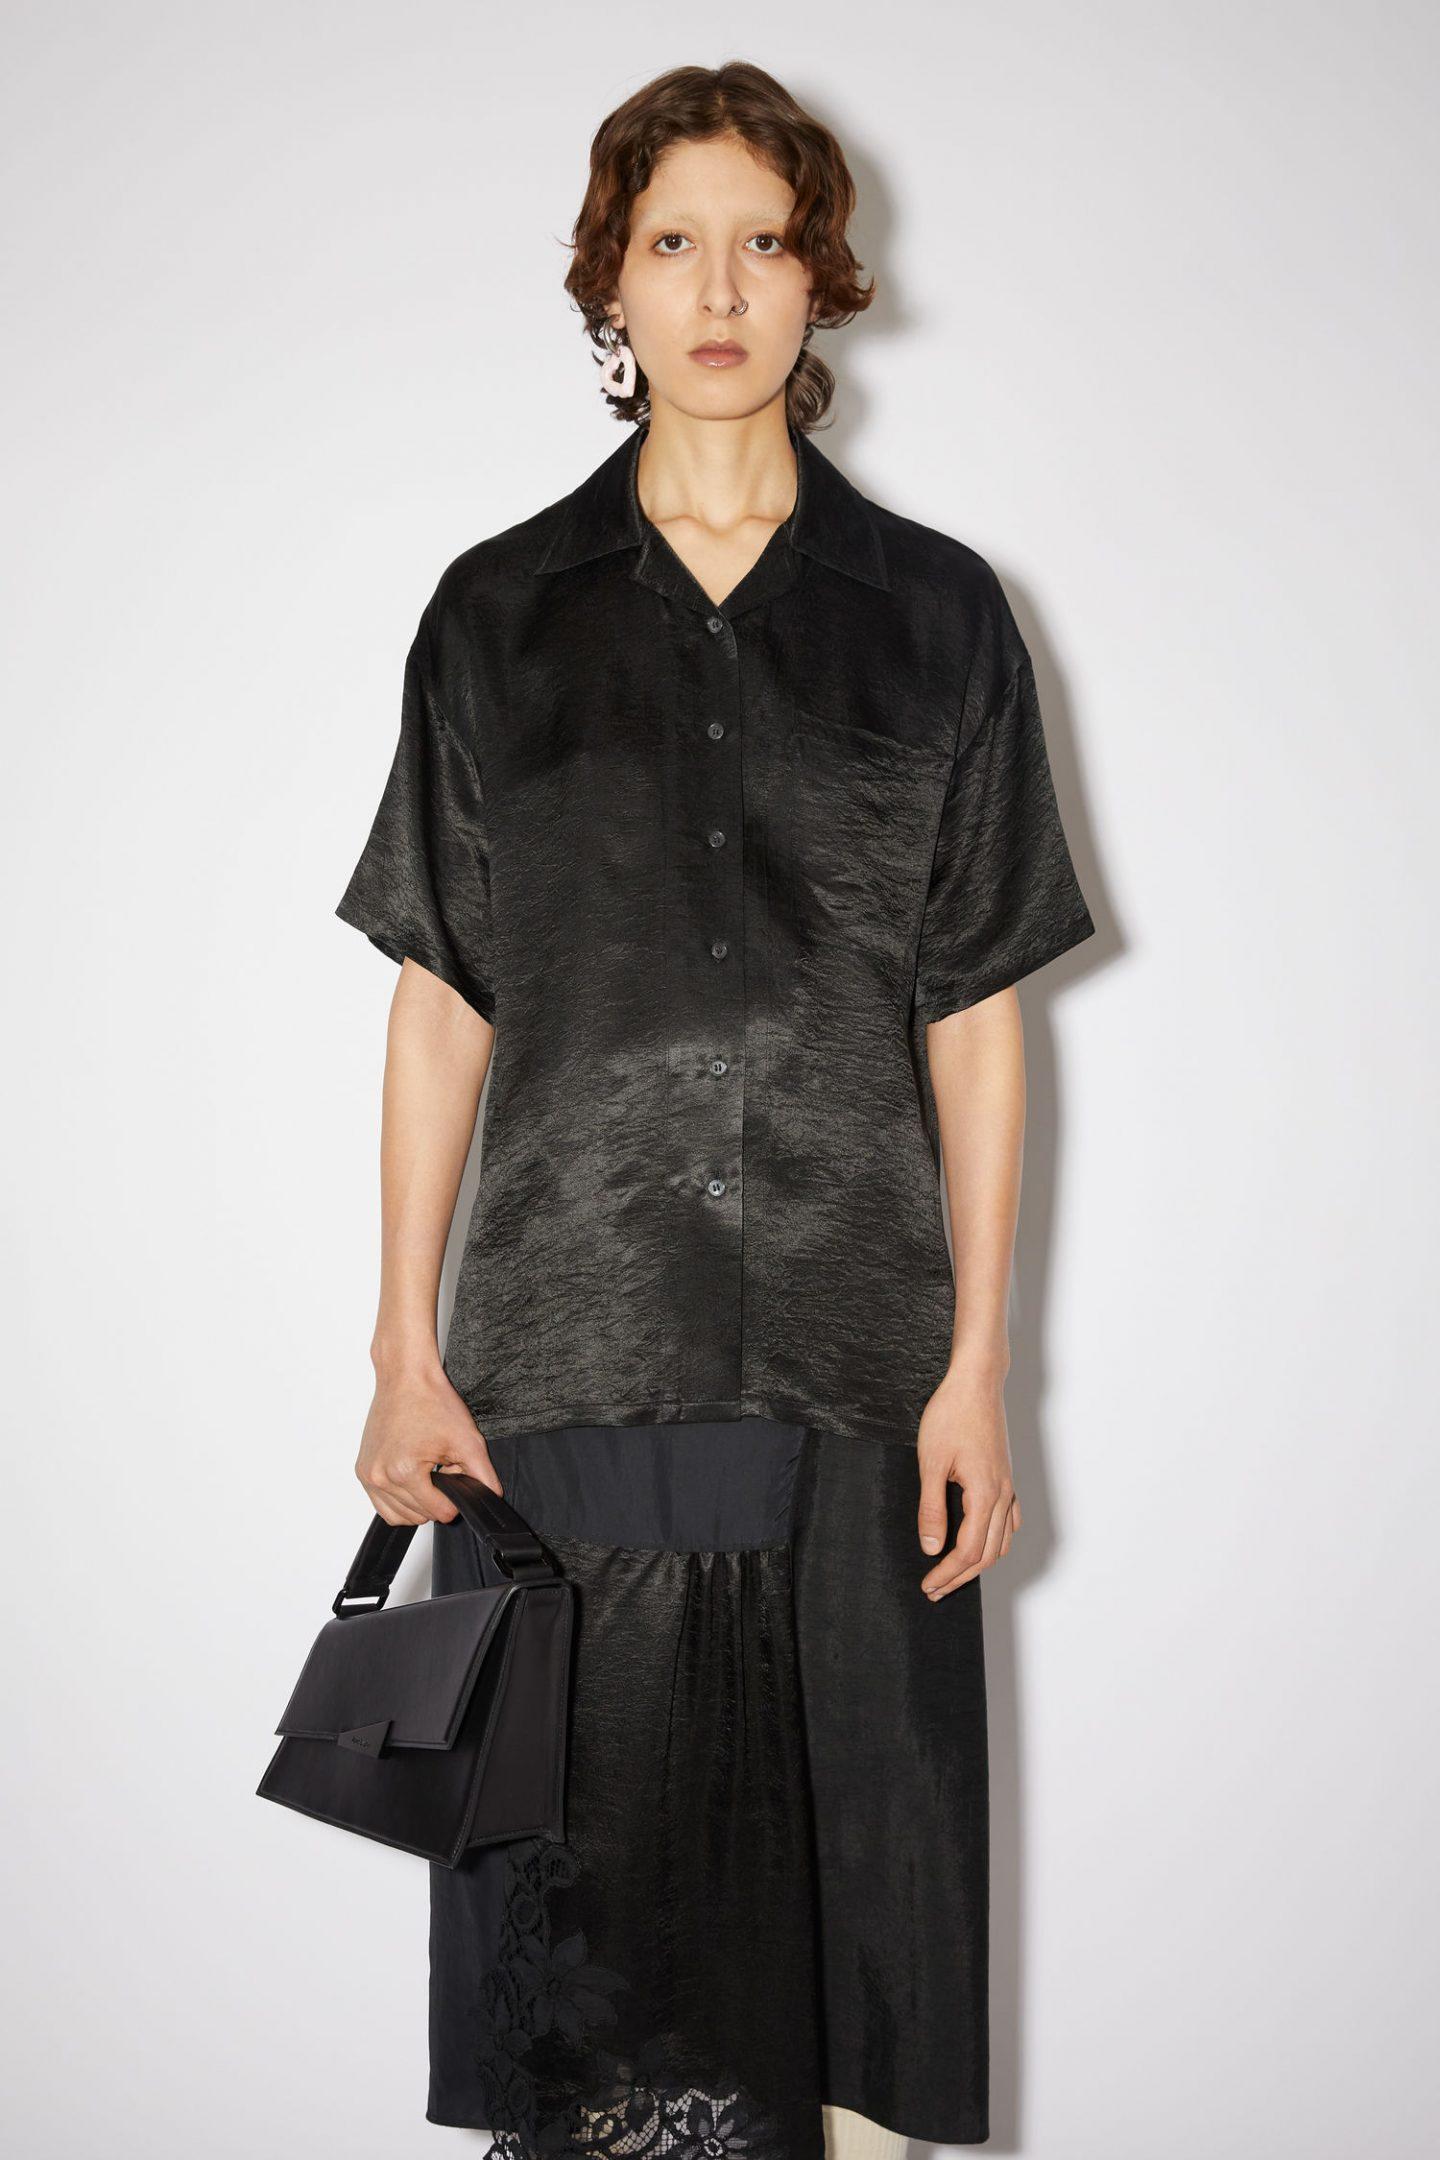 ACNE studios black clothing